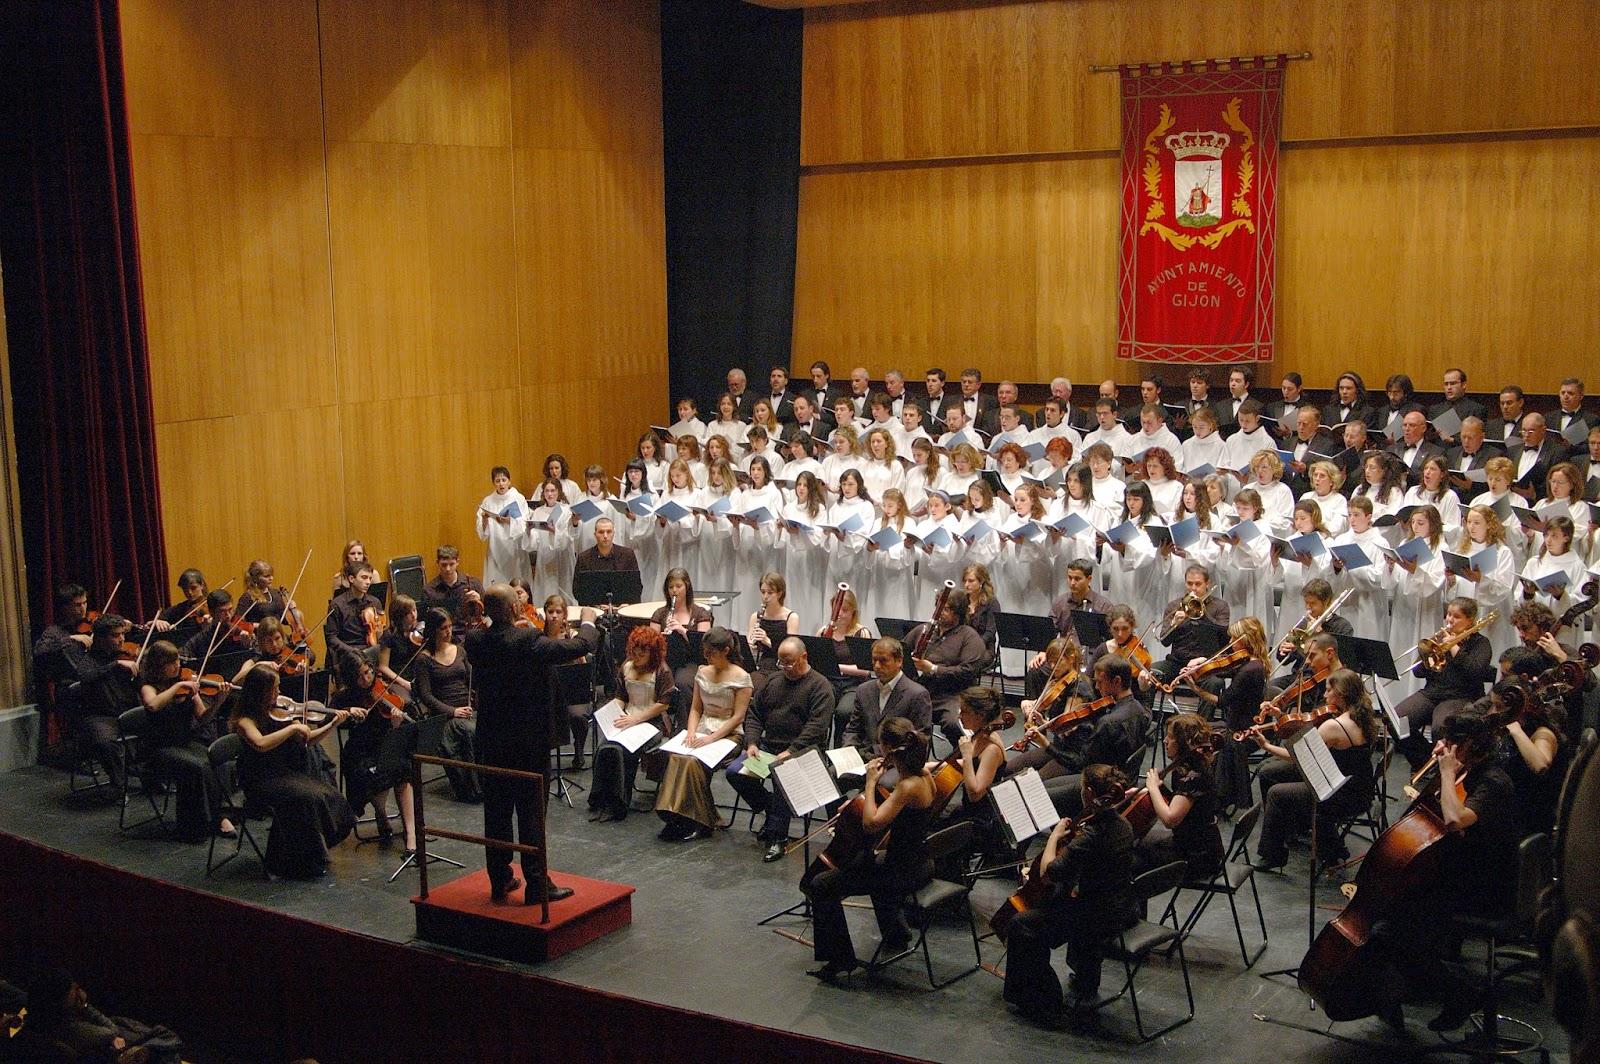 Orquesta sinf nica del conservatorio de gij n la orquesta - Conservatorio musica bilbao ...